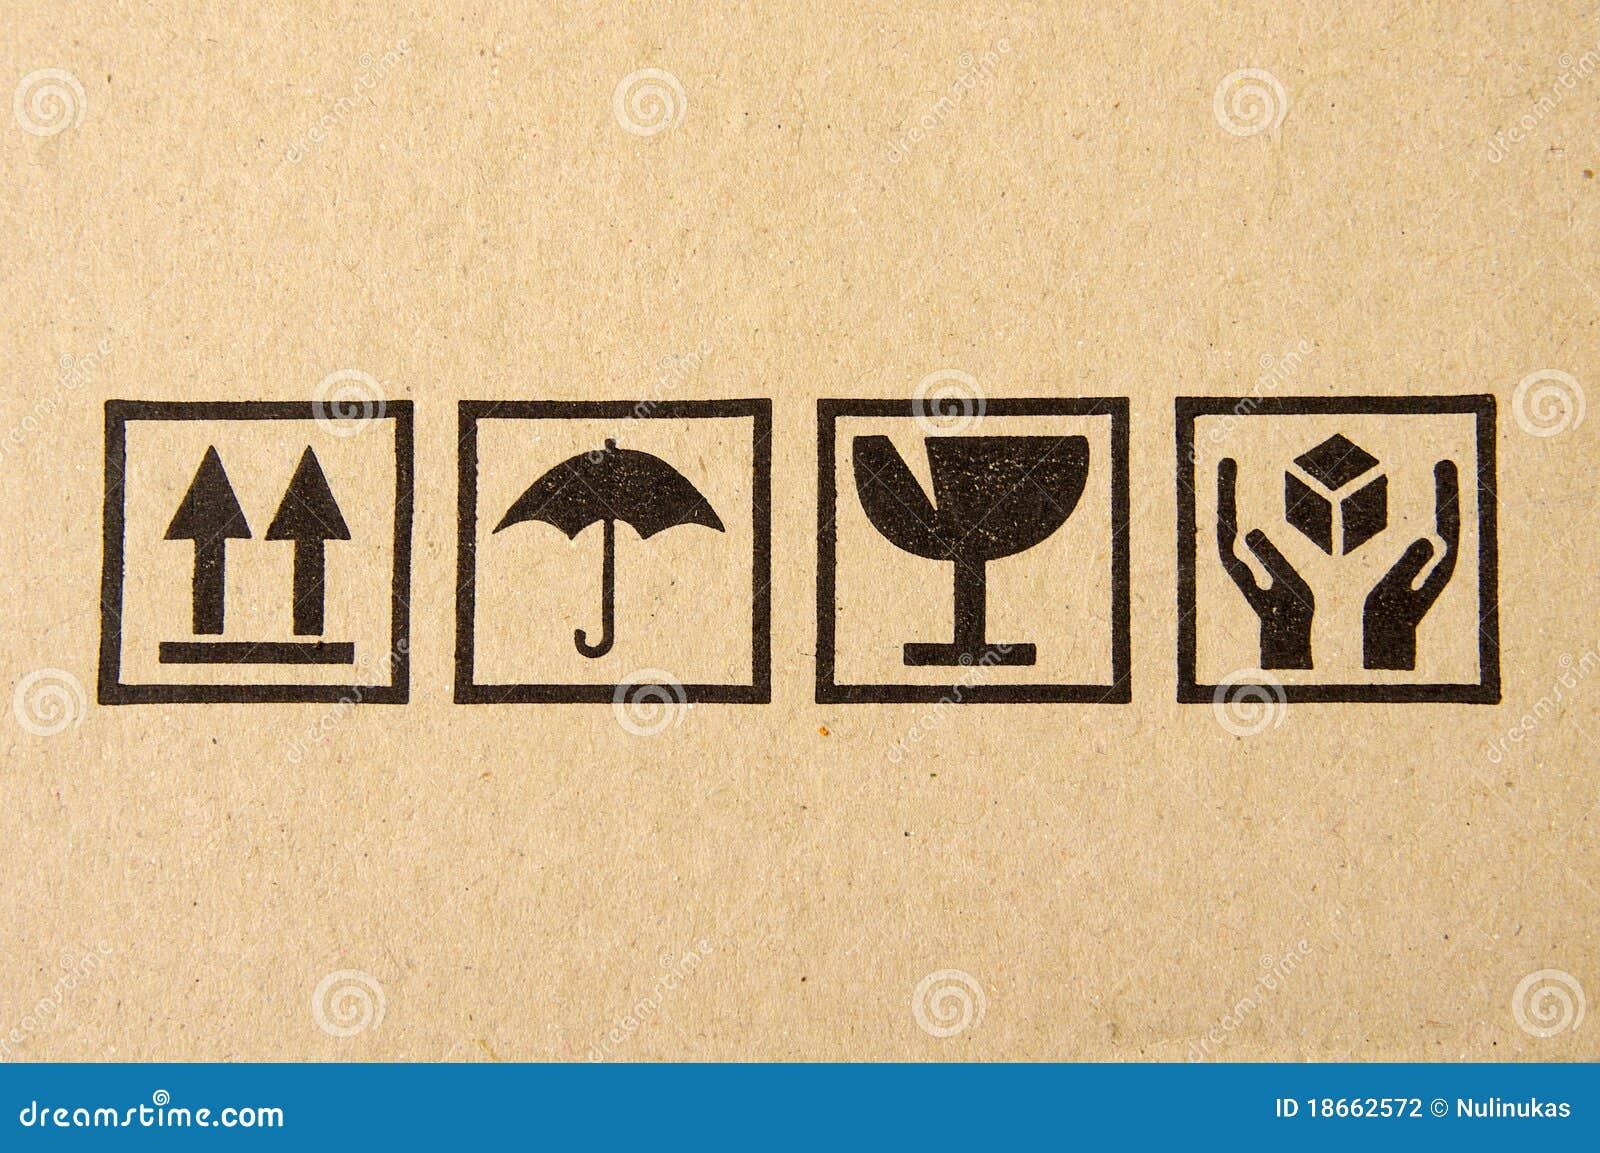 Black fragile symbol on cardboard